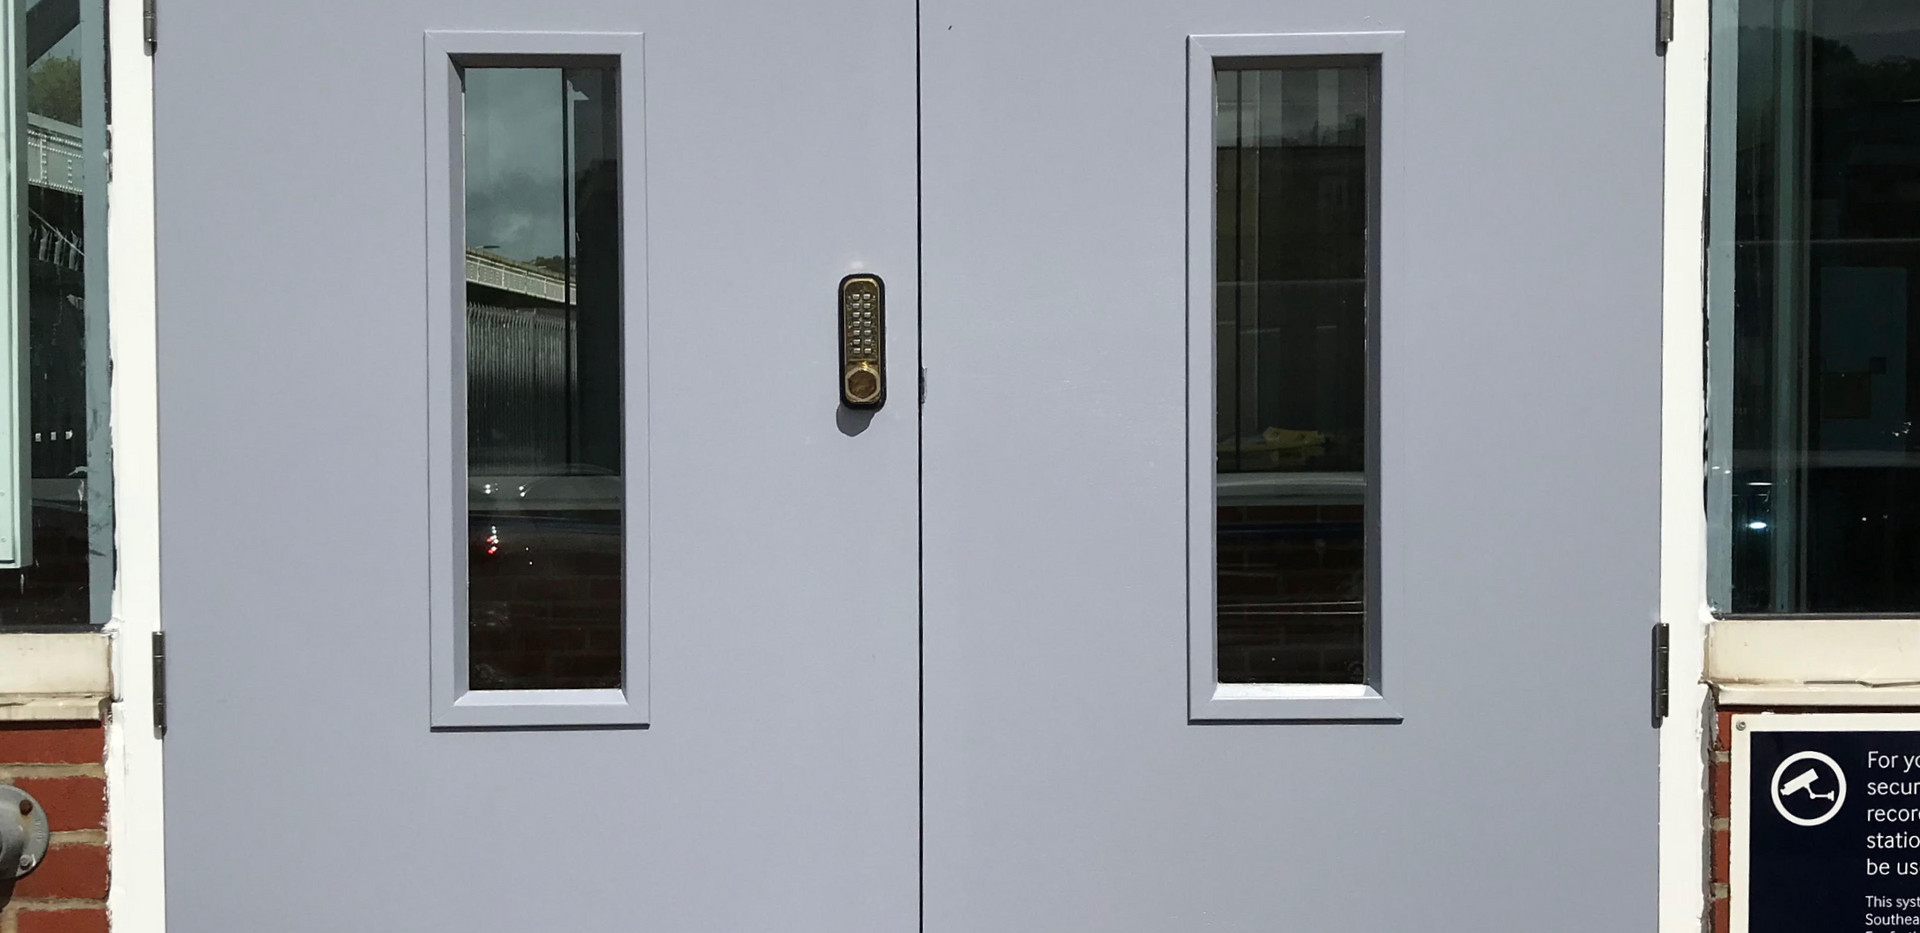 Hastings train station door with digilocks